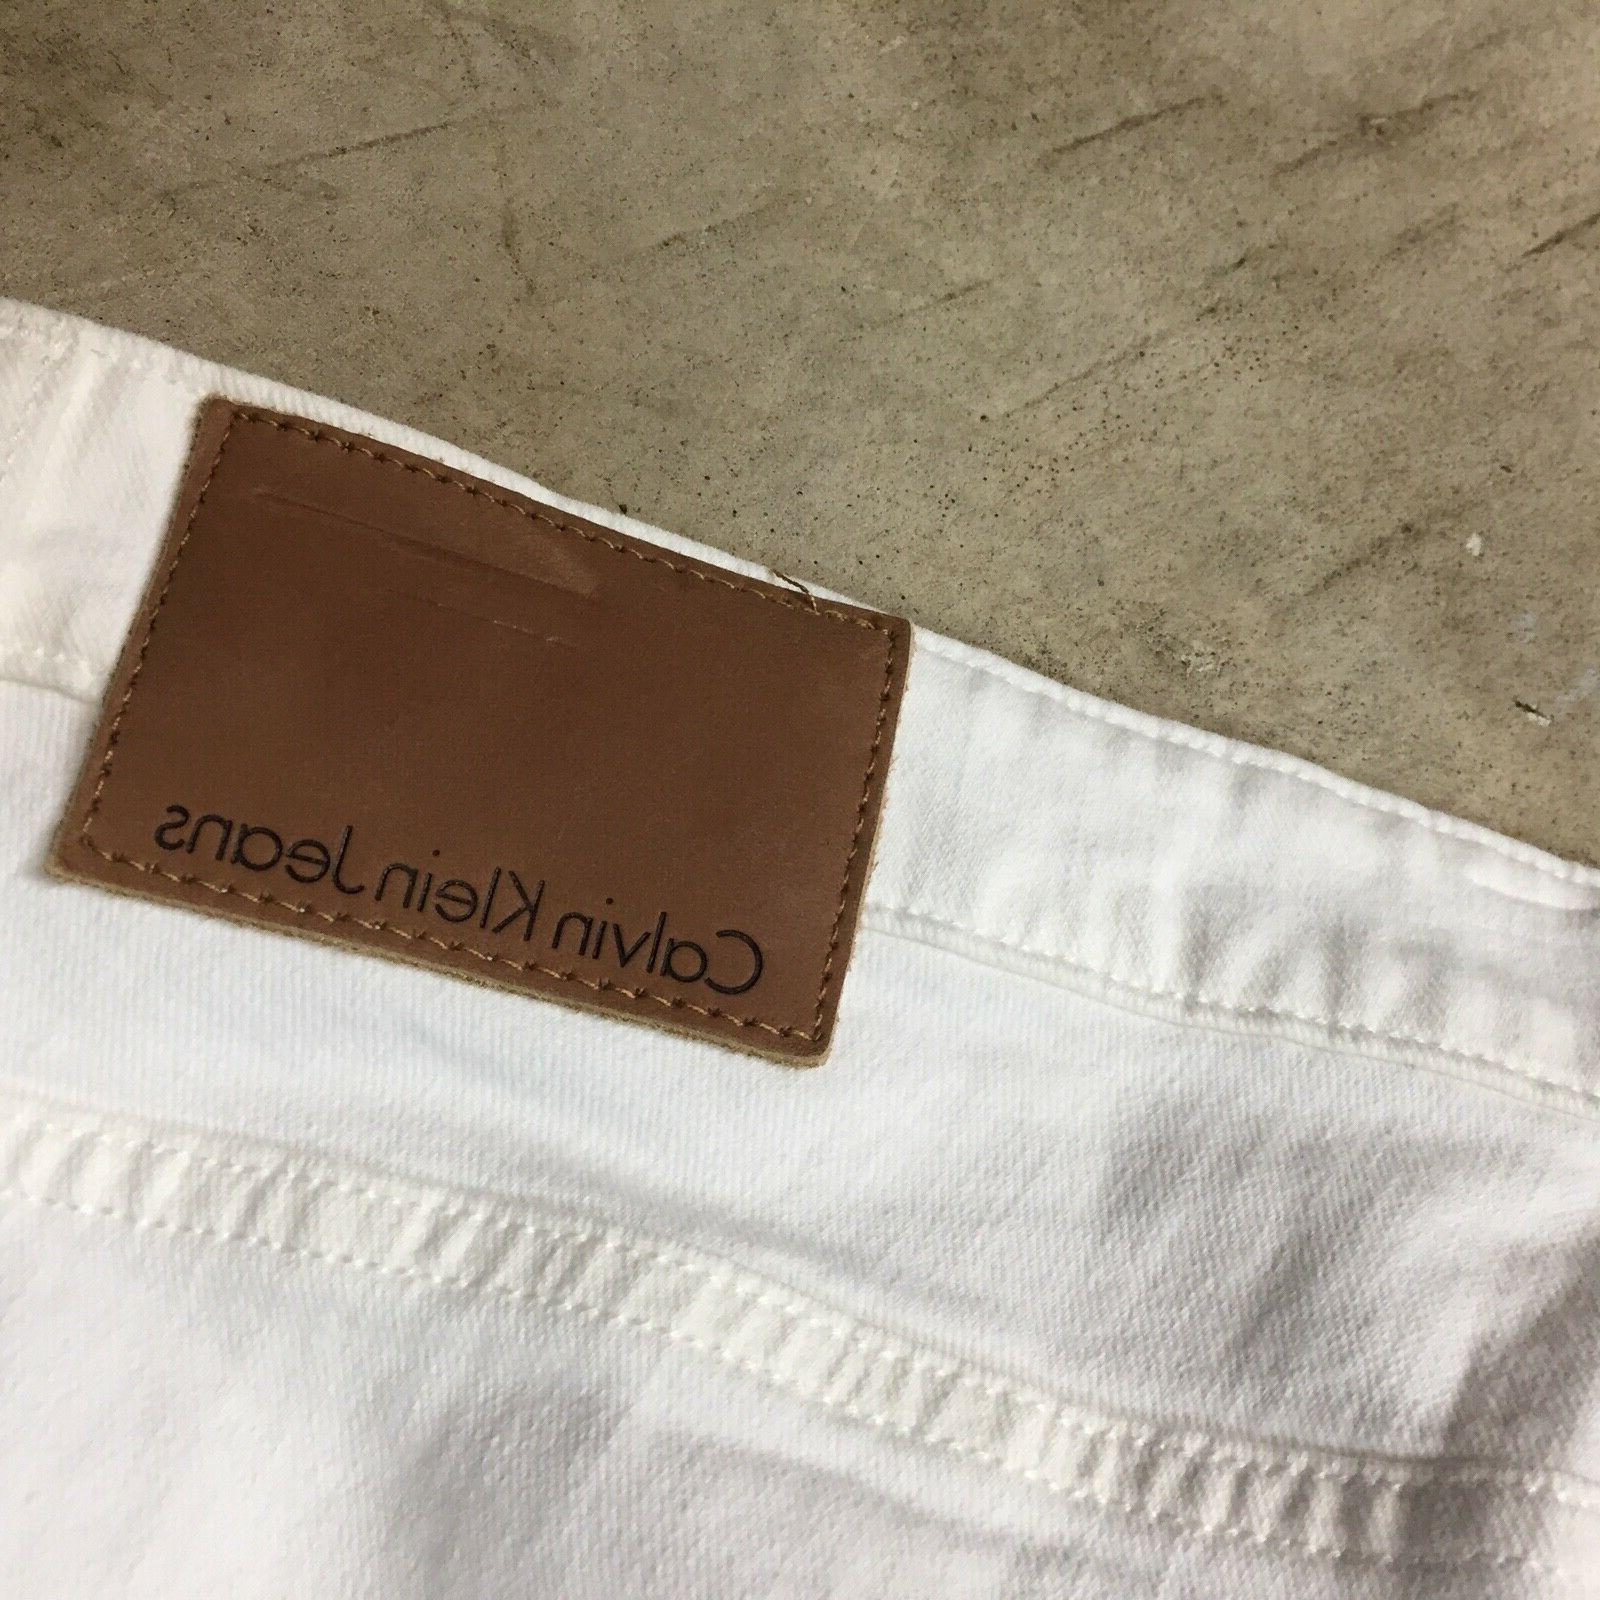 NEW mens Calvin jeans slim distressed